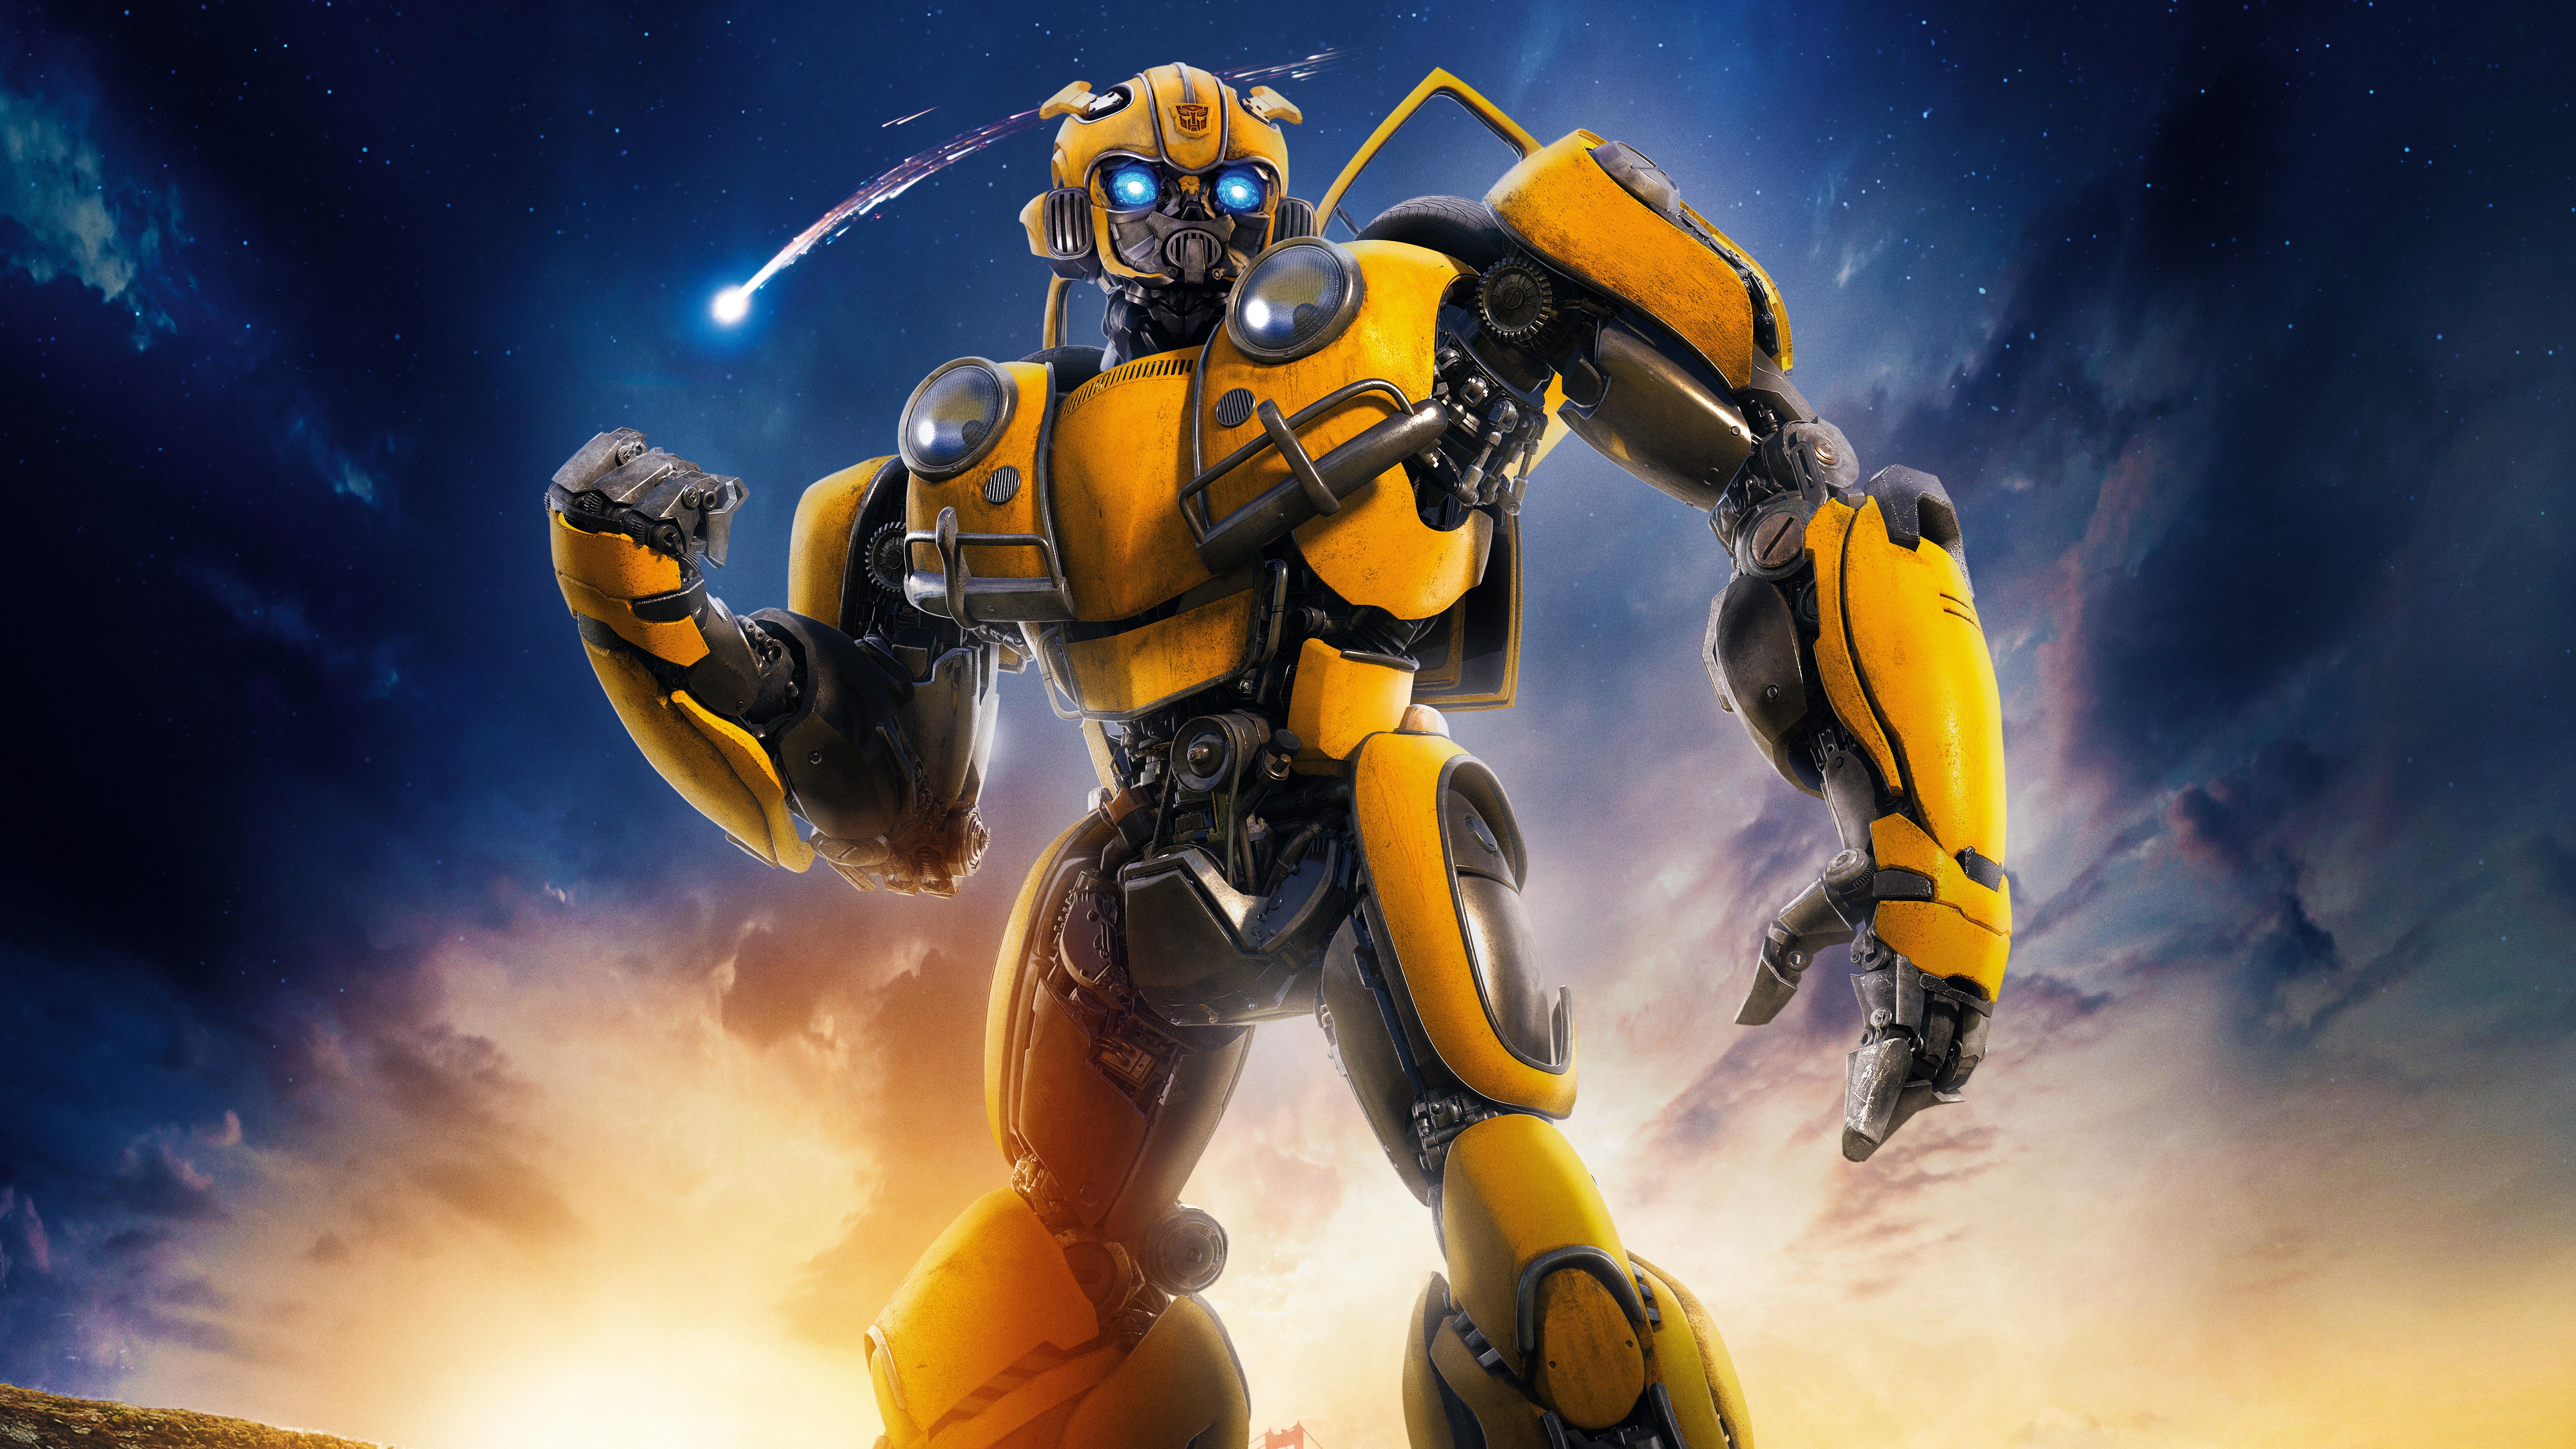 1366x768 Bumblebee Movie 8k 2018 1366x768 Resolution HD 4k ...